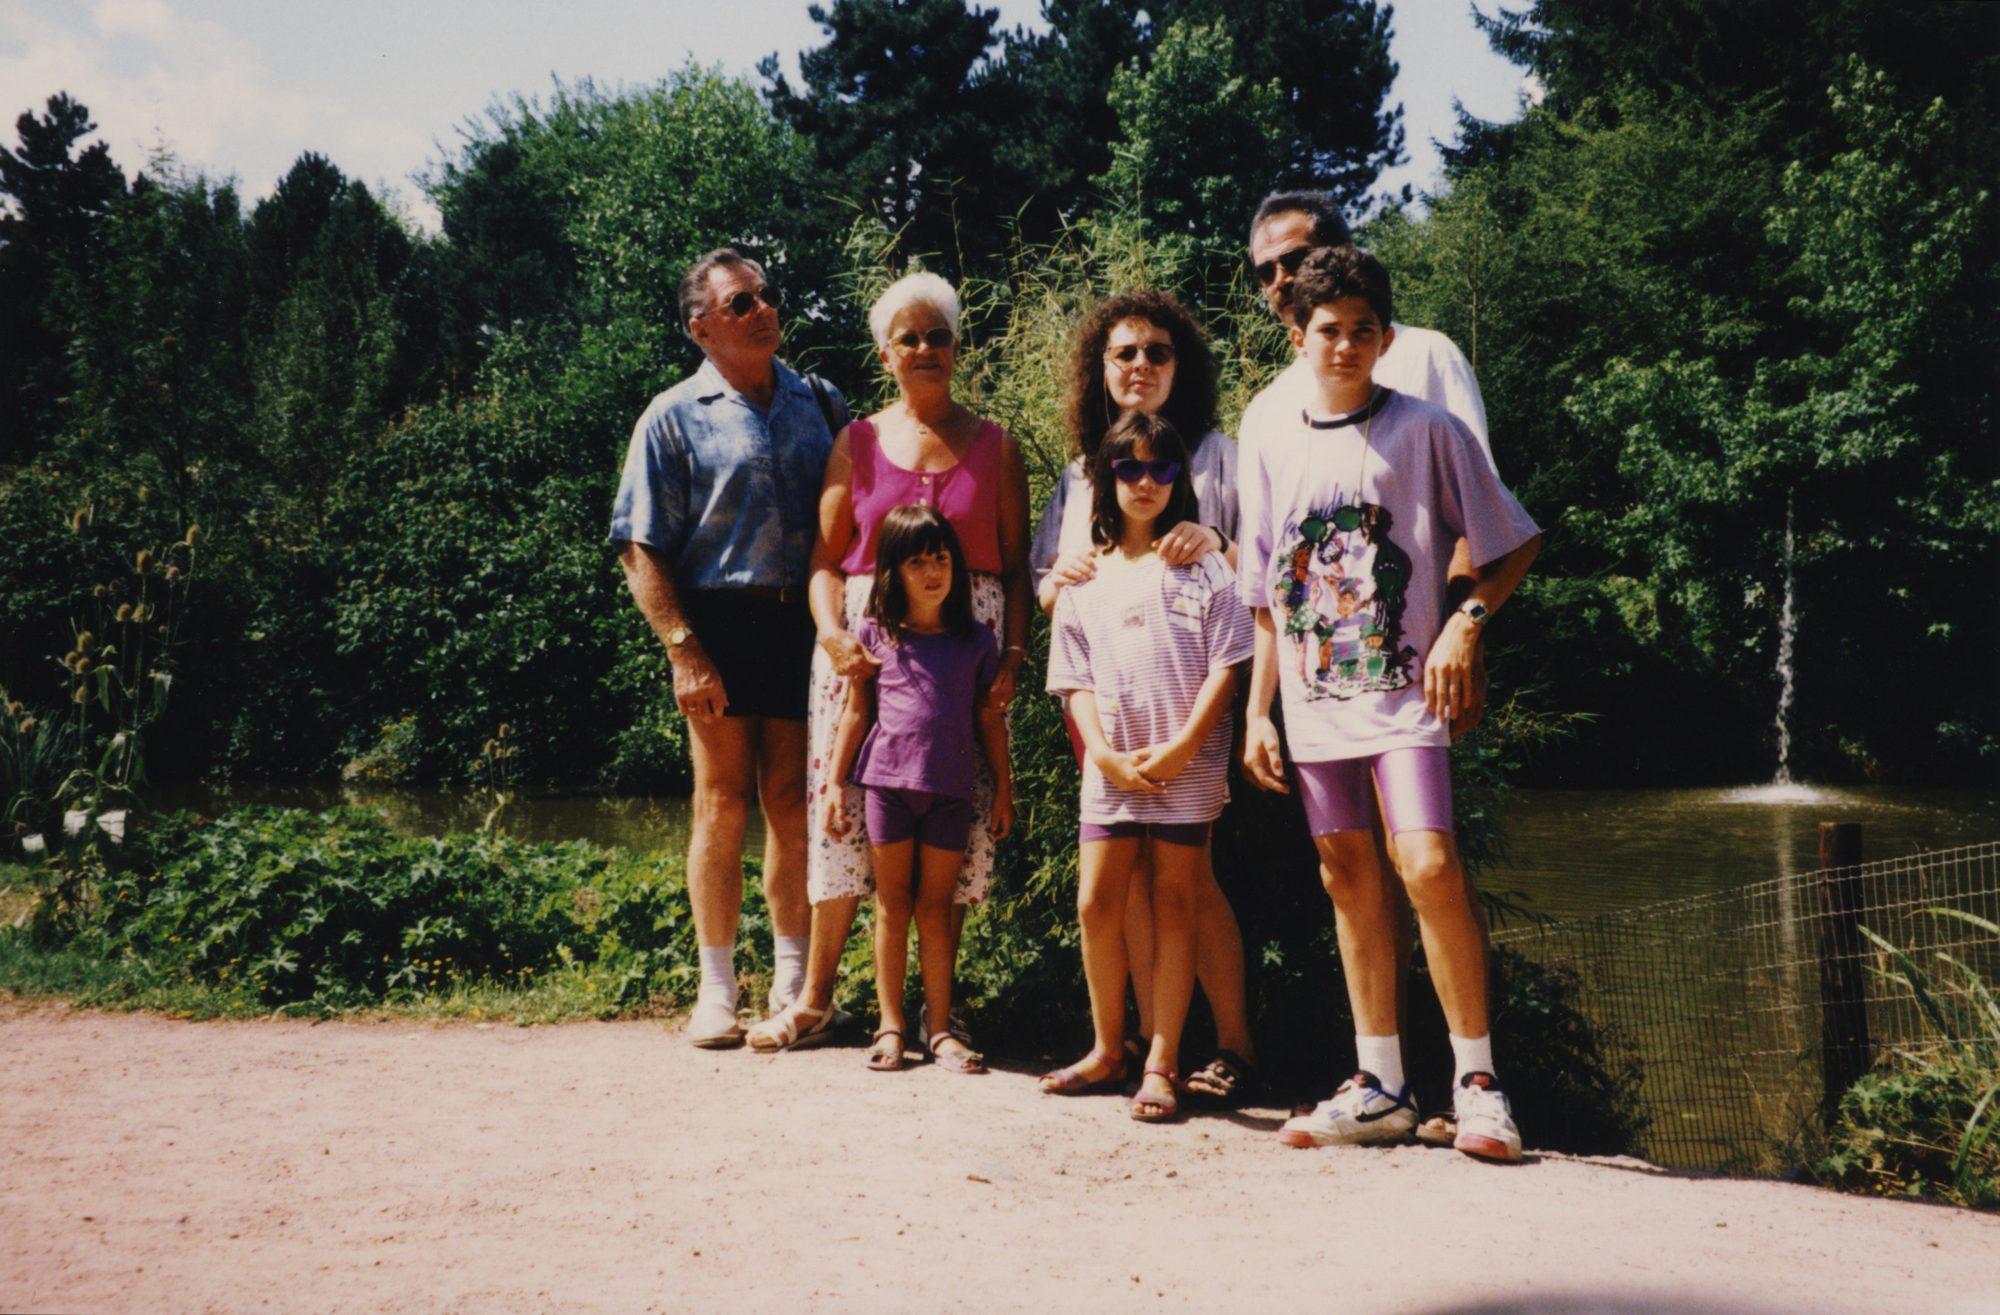 Sommer 1991 - Familienausflug mit Opi, Omi, Tammi, Edith, Sabrina, Vater und mir.